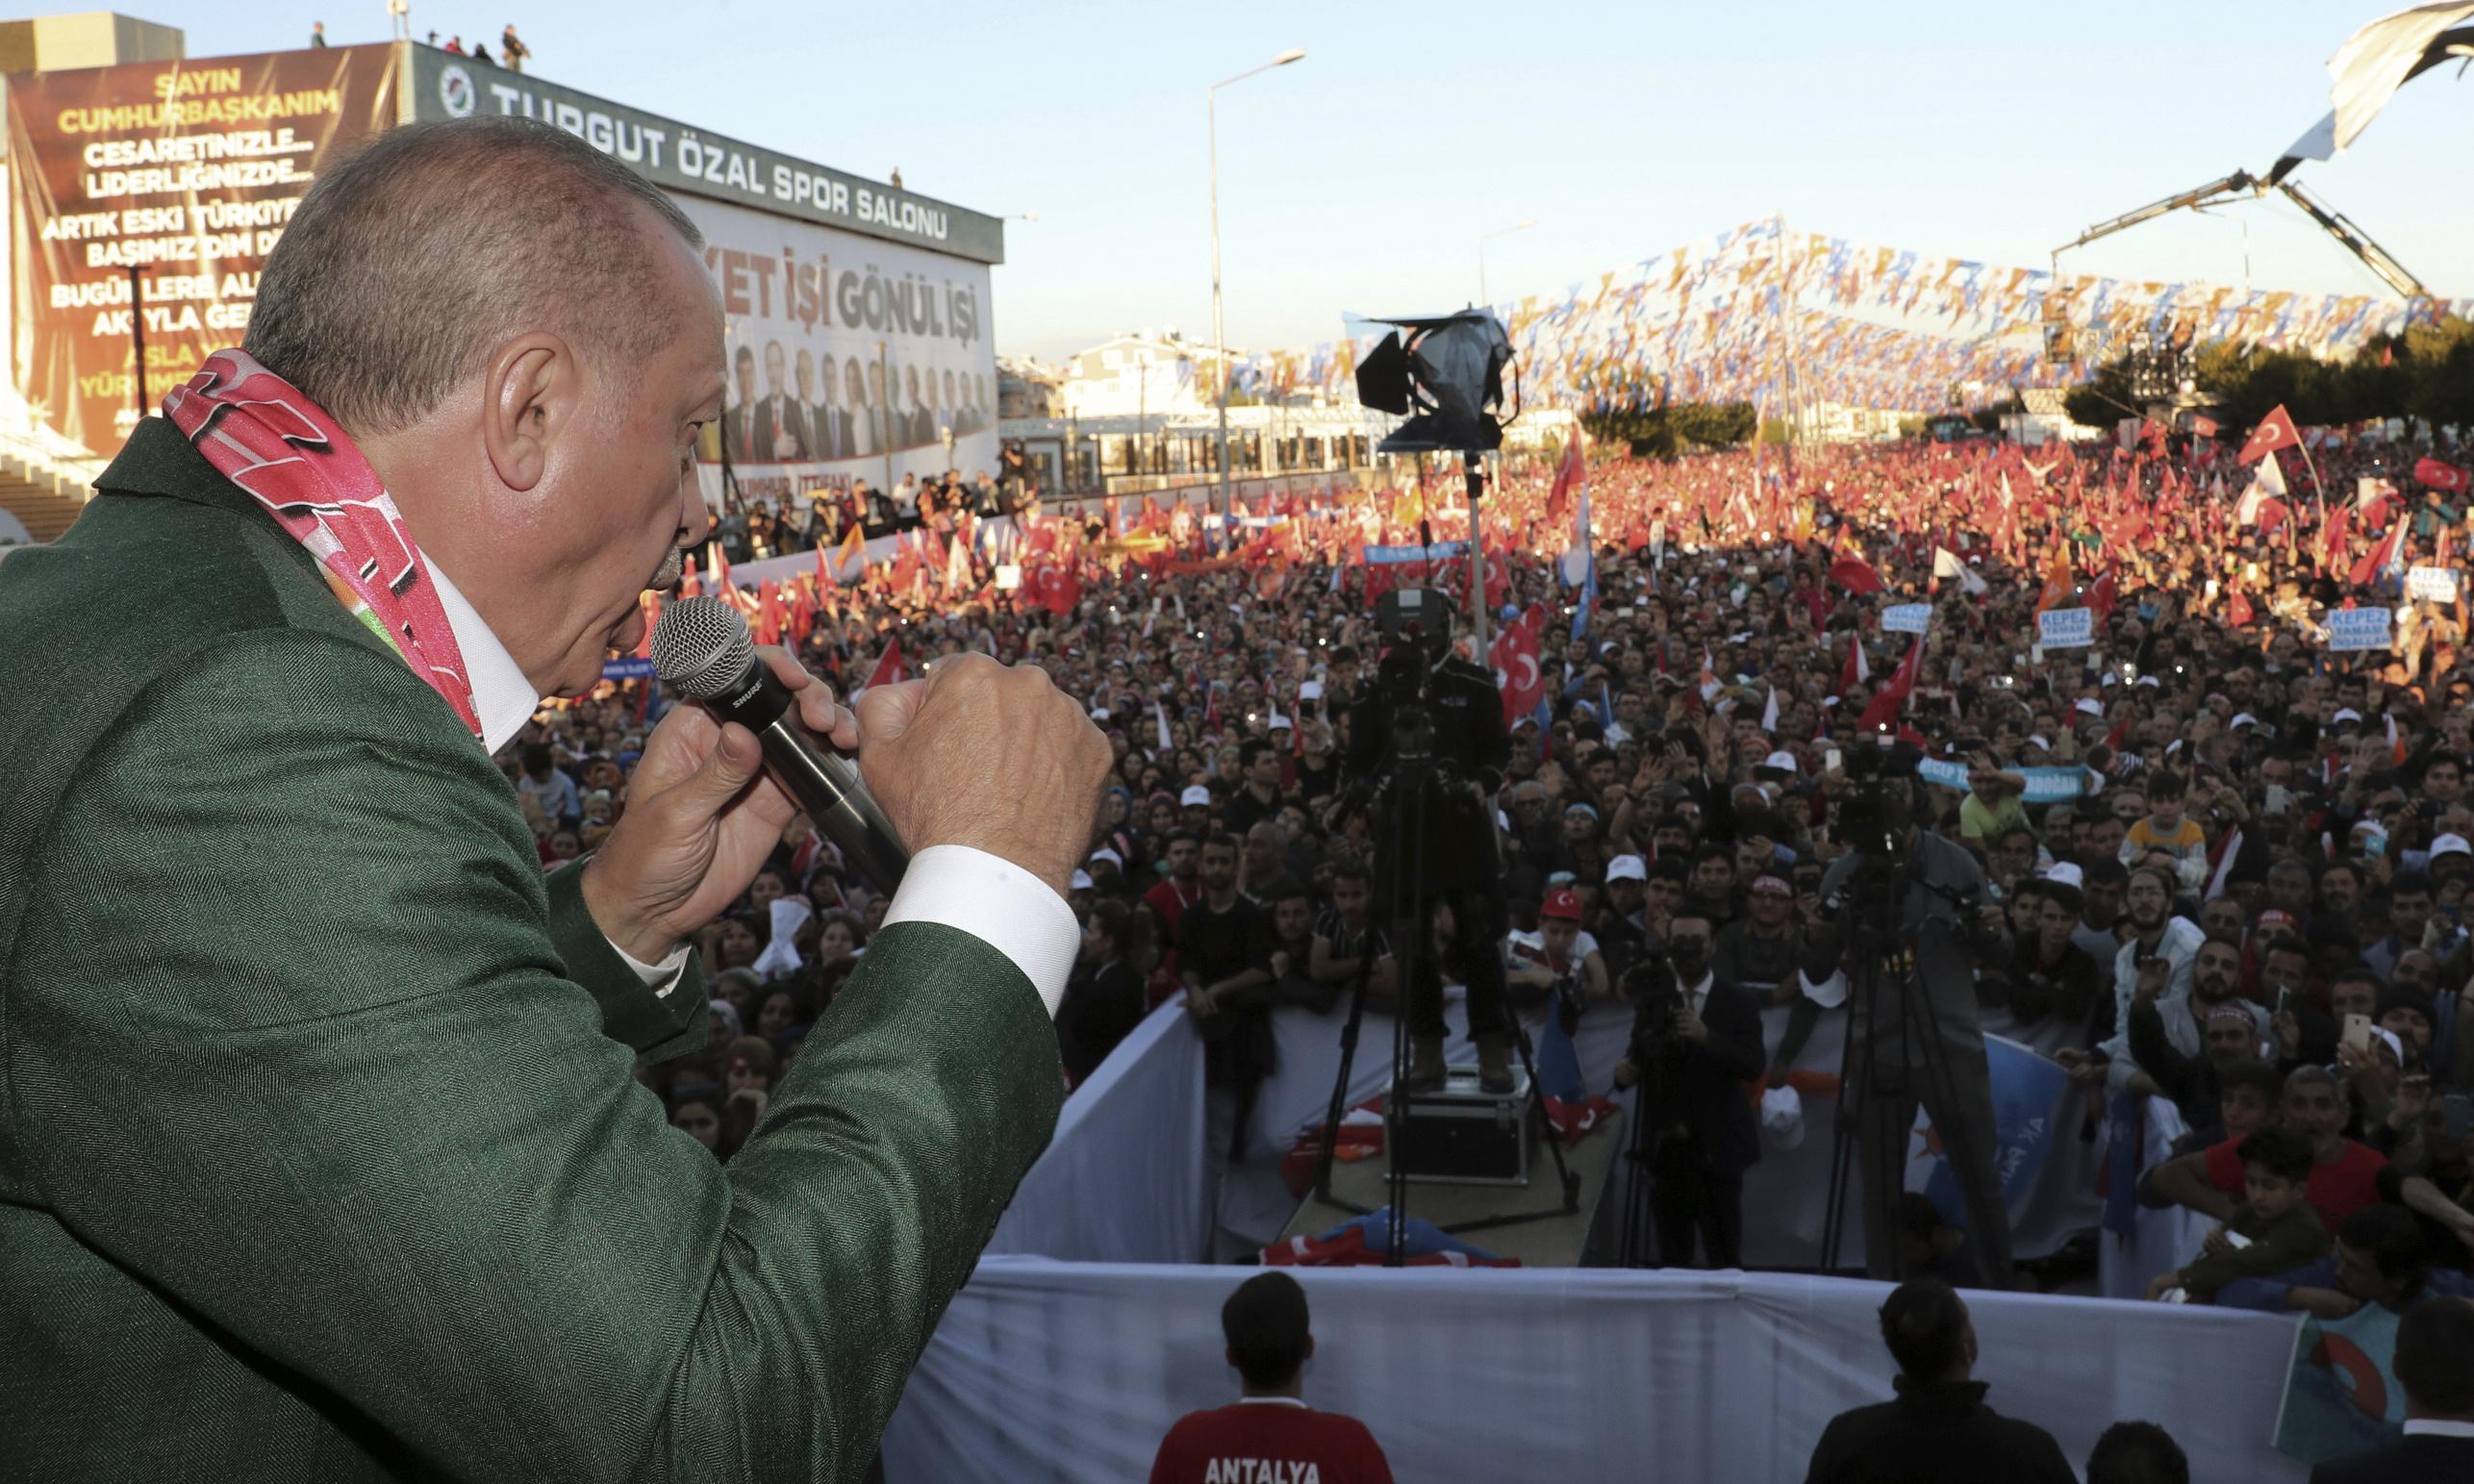 Erdoğan shows Christchurch attack footage at rallies